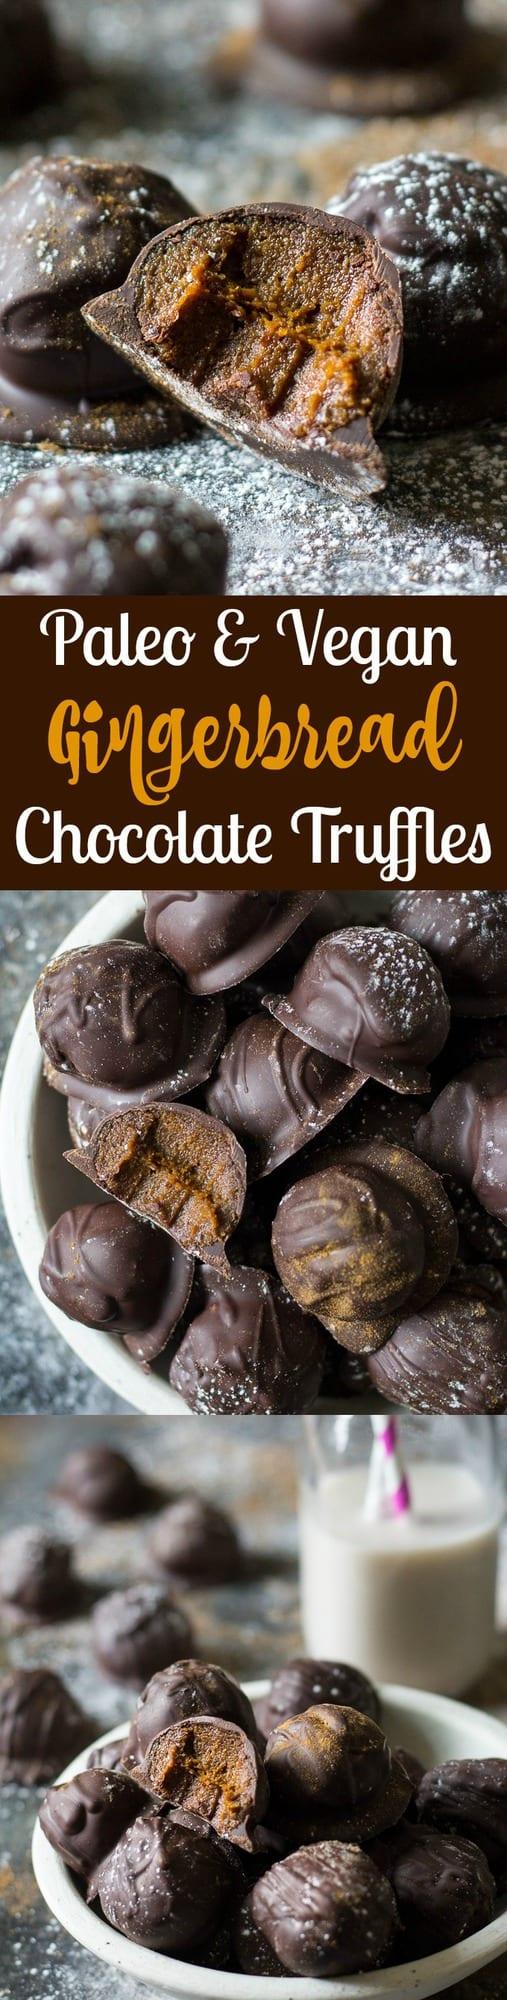 paleo-vegan-gingerbread-chocolate-truffles